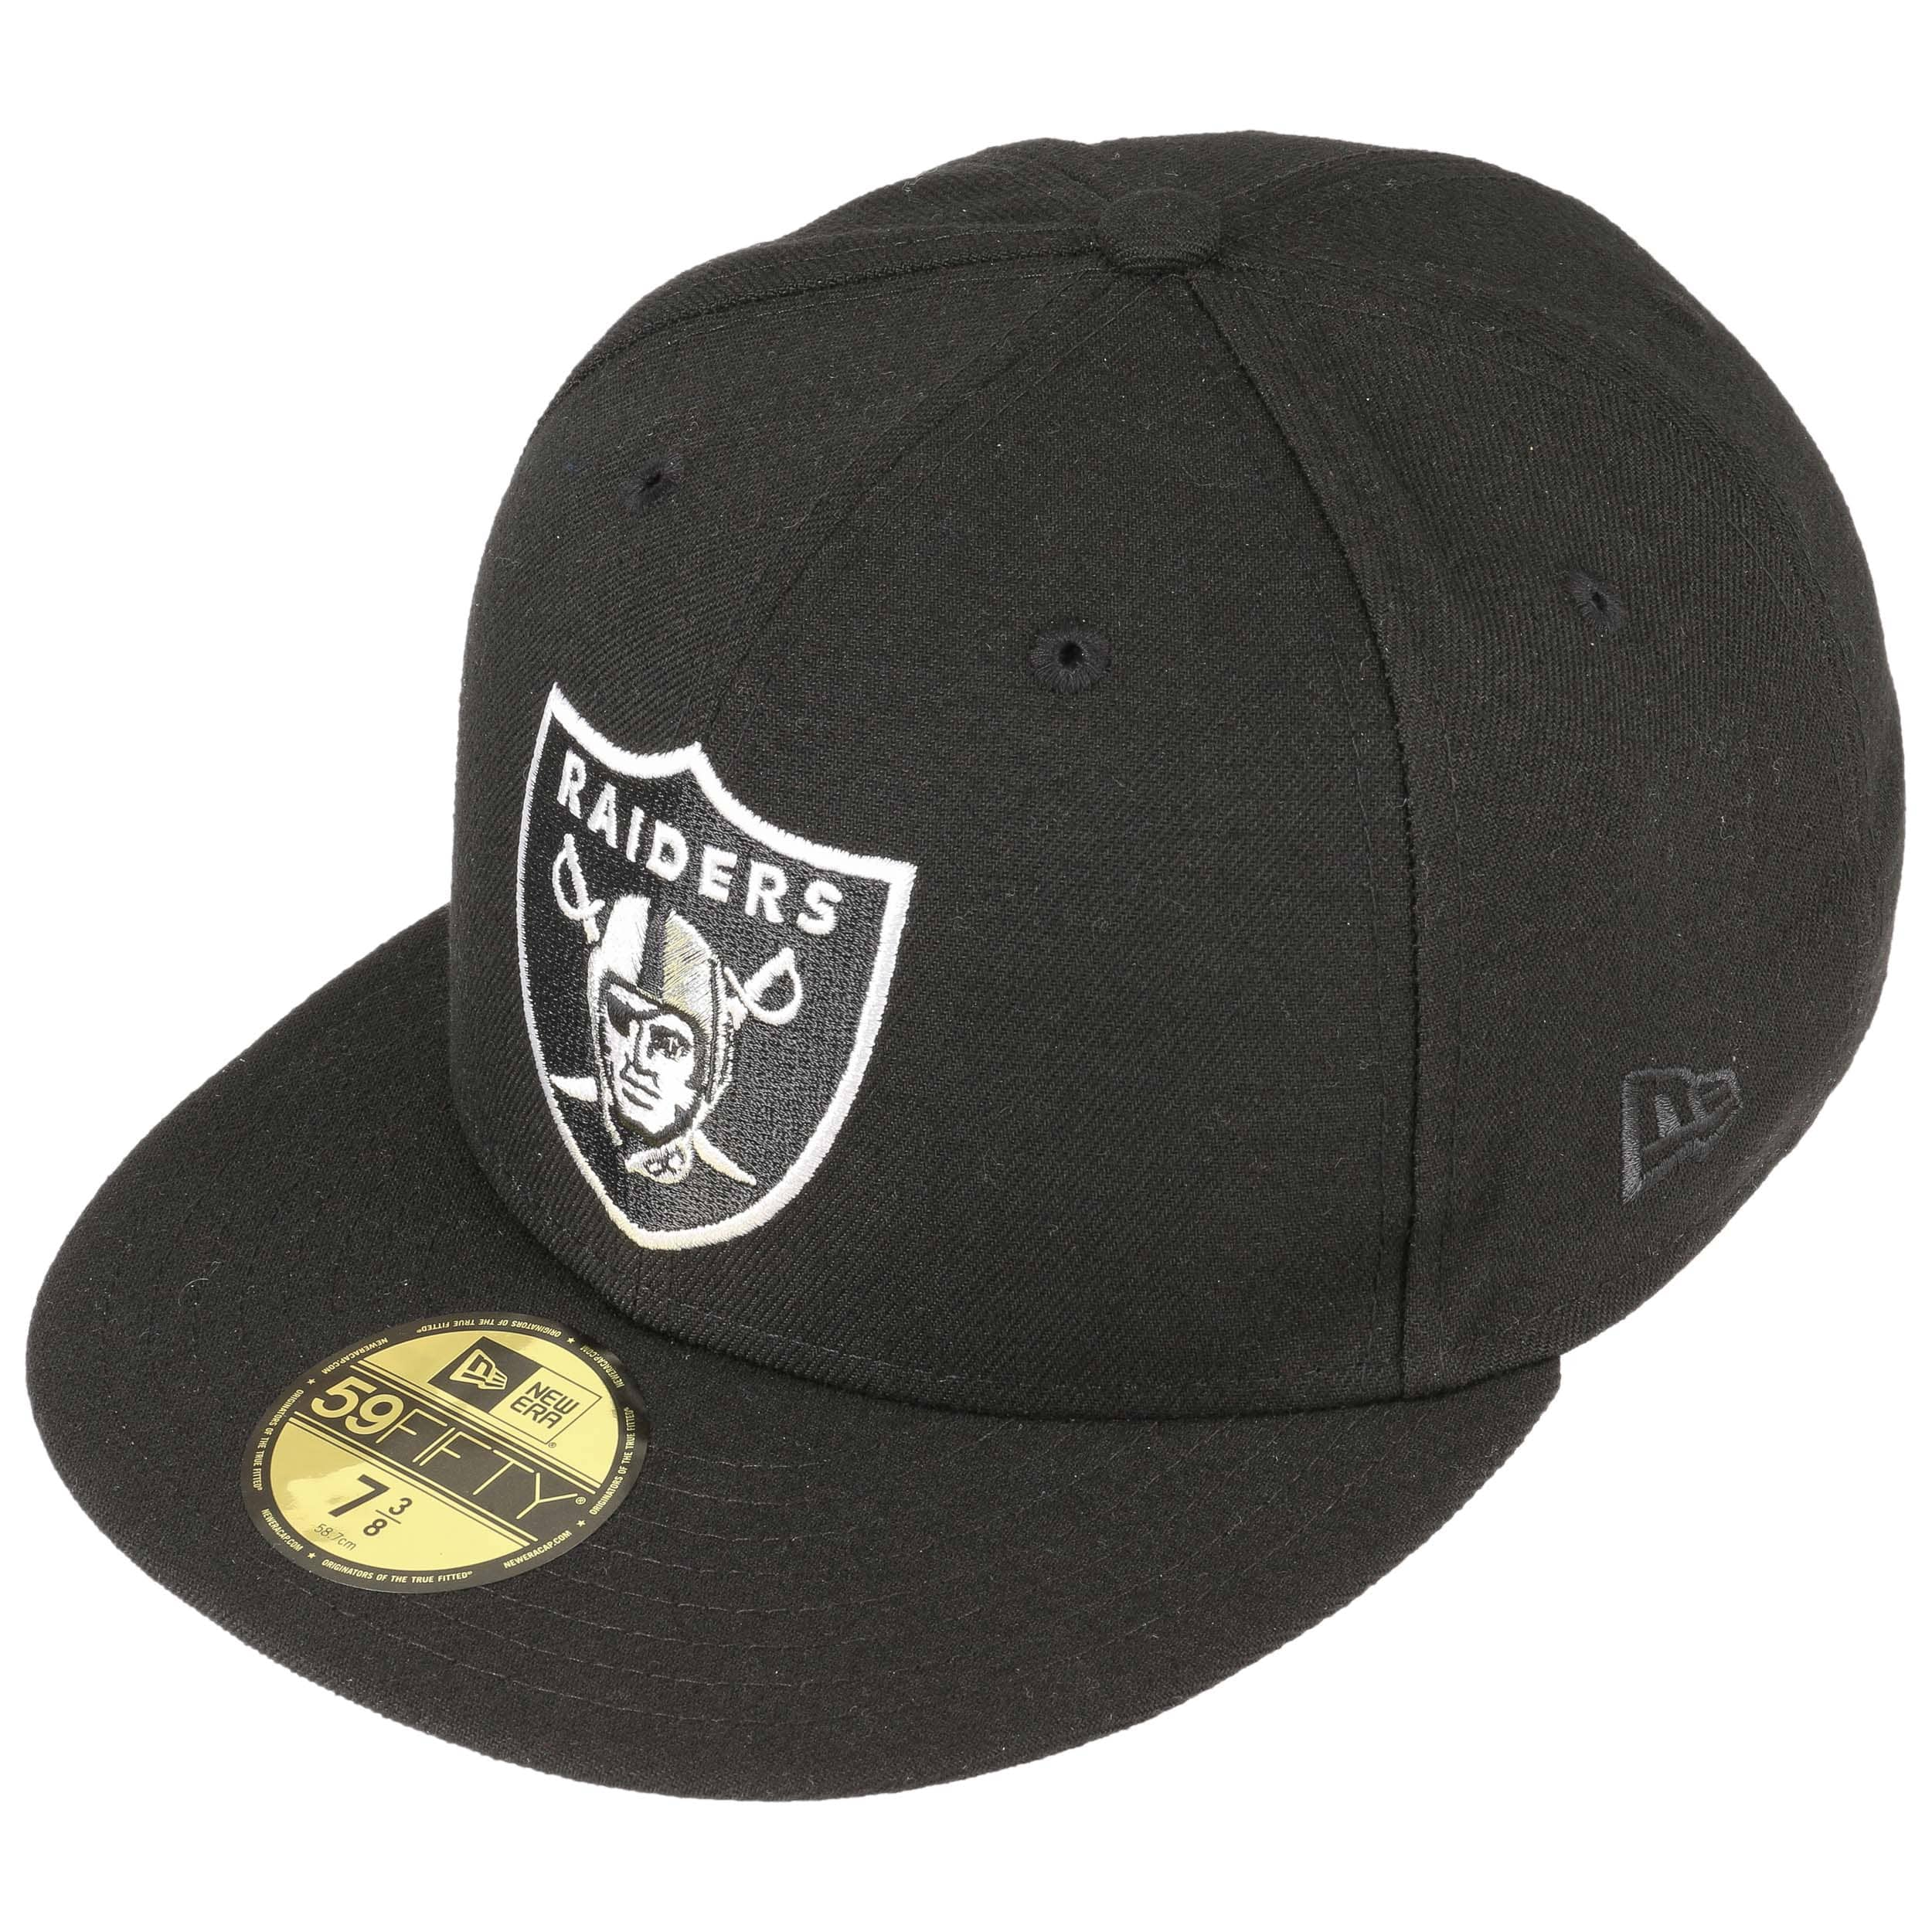 9b79389e2 59Fifty NFL Classic Raiders Cap by New Era - black 1 ...